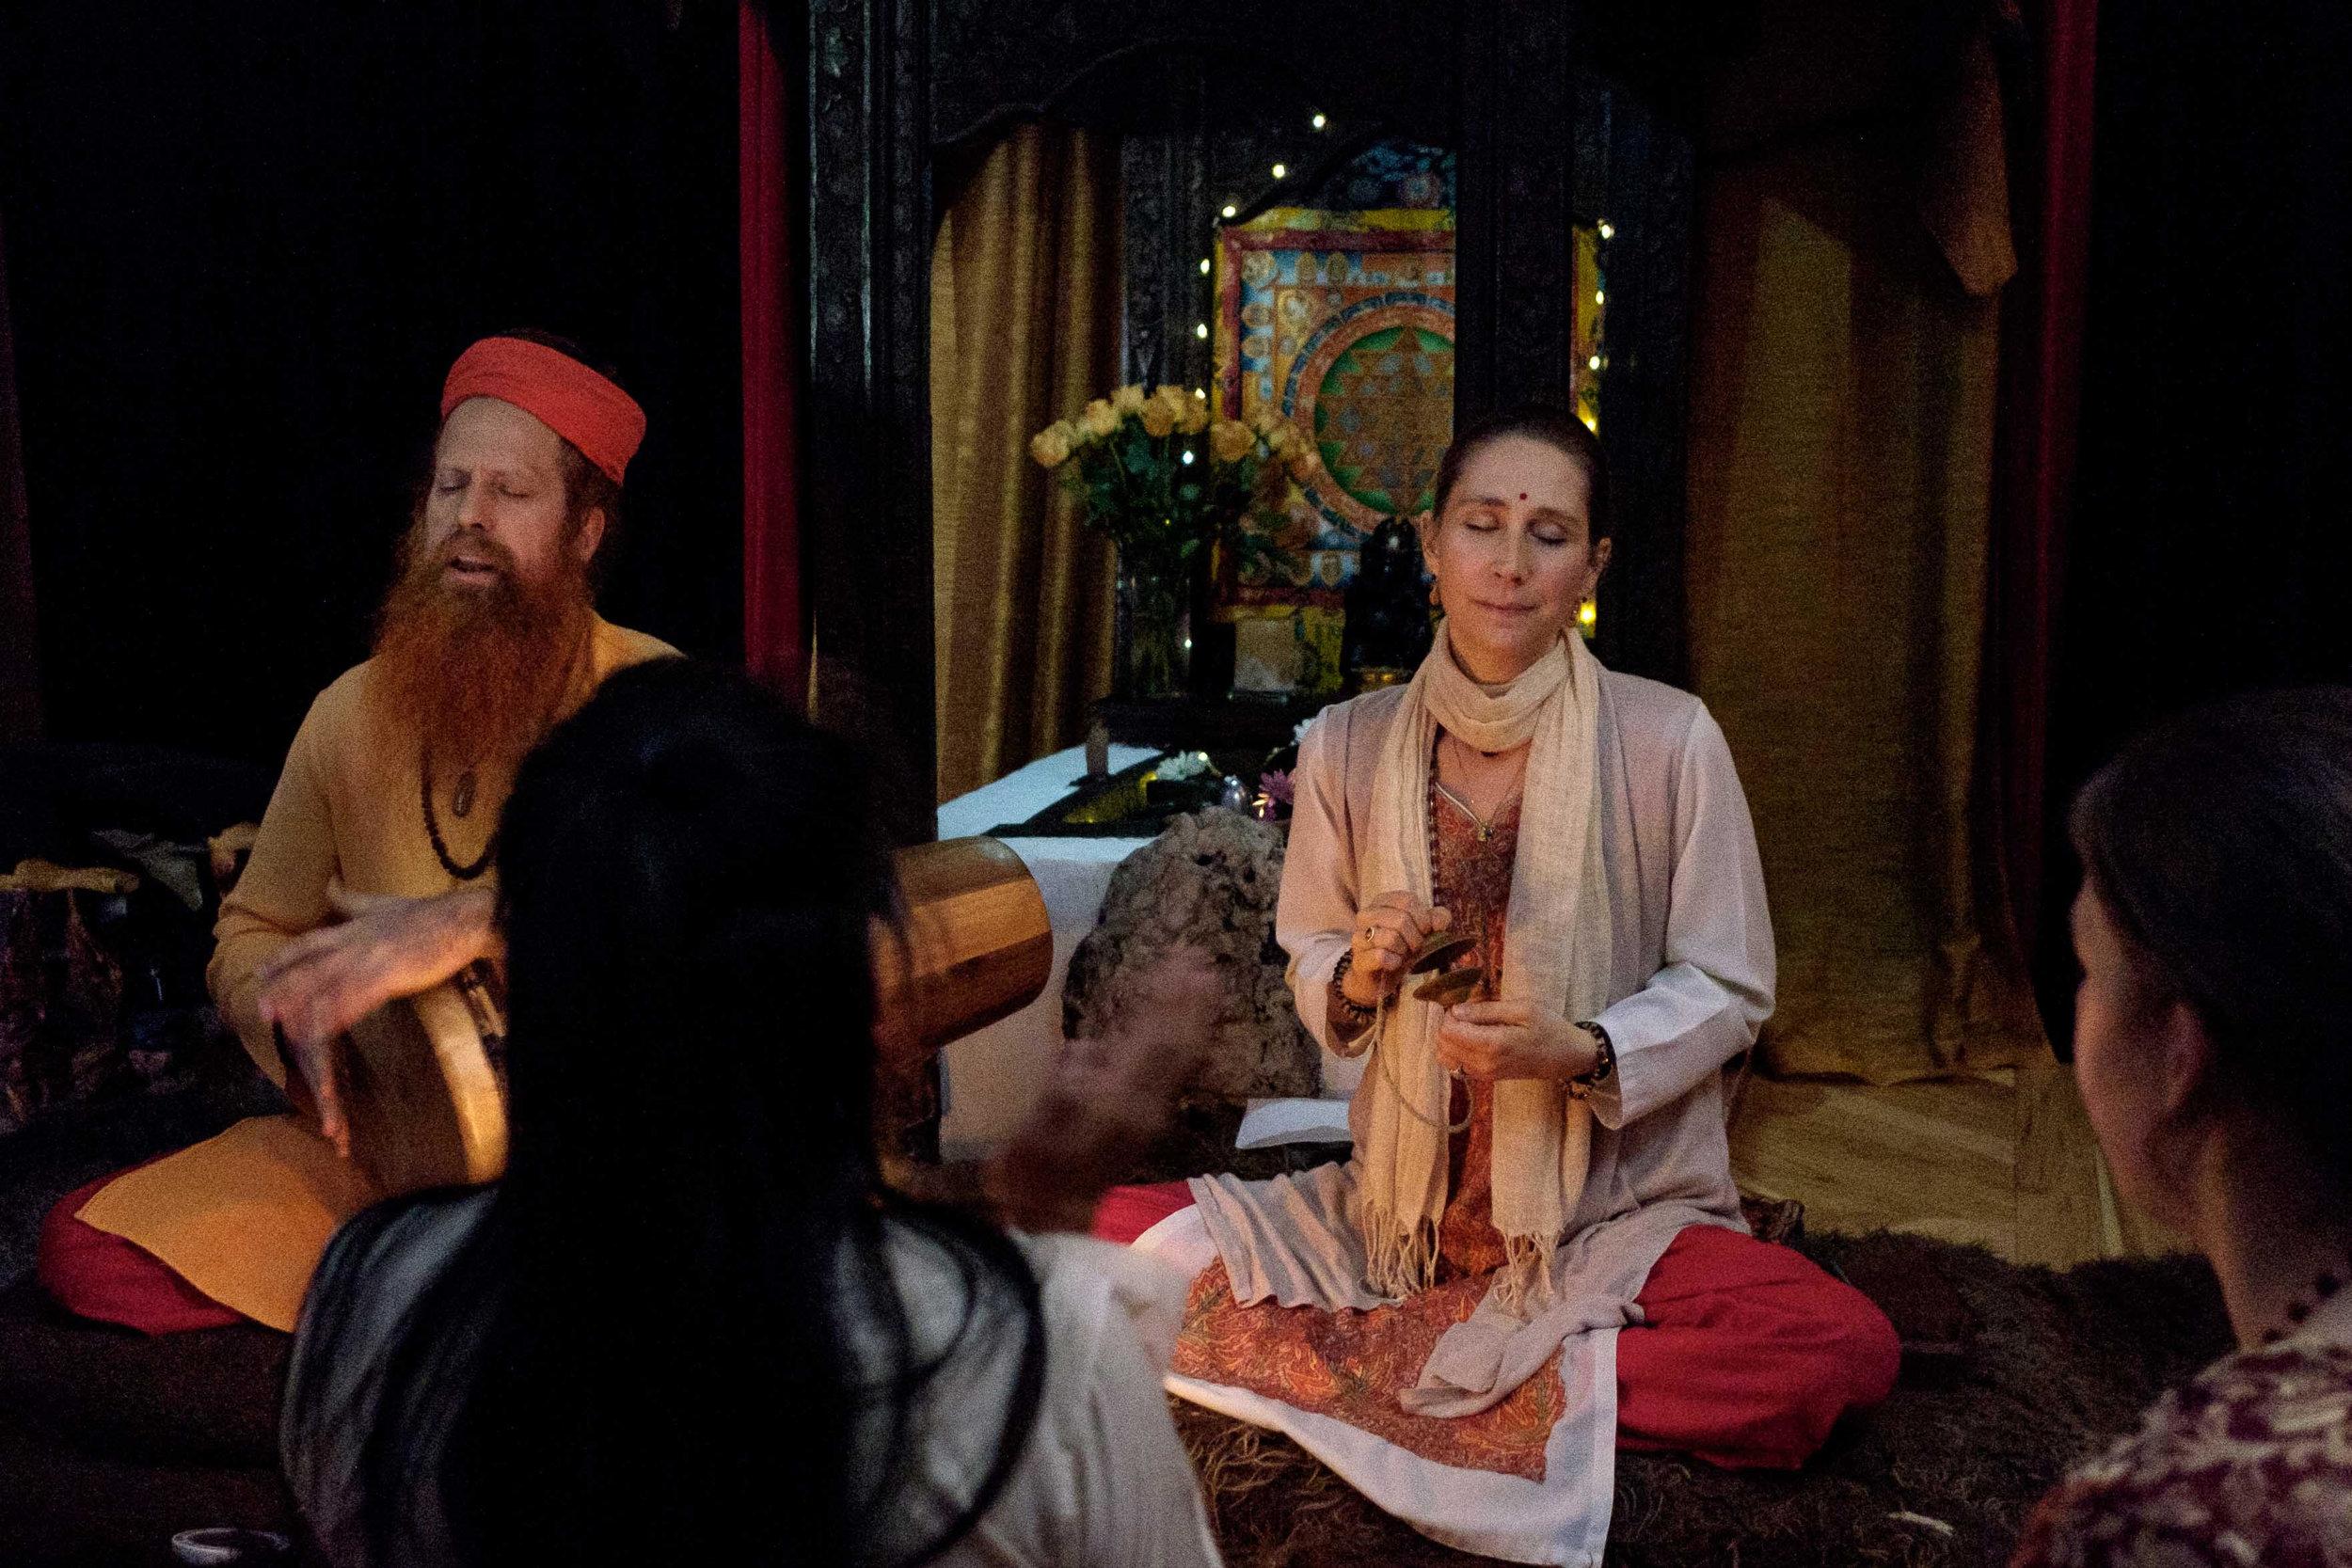 Our Gurus, Sri Bhagavan VaShi Baba and Sri Mirabai Ishwari, leading Kirtan before Satsang, teachings for the disciples of Hridaya Hermitage.